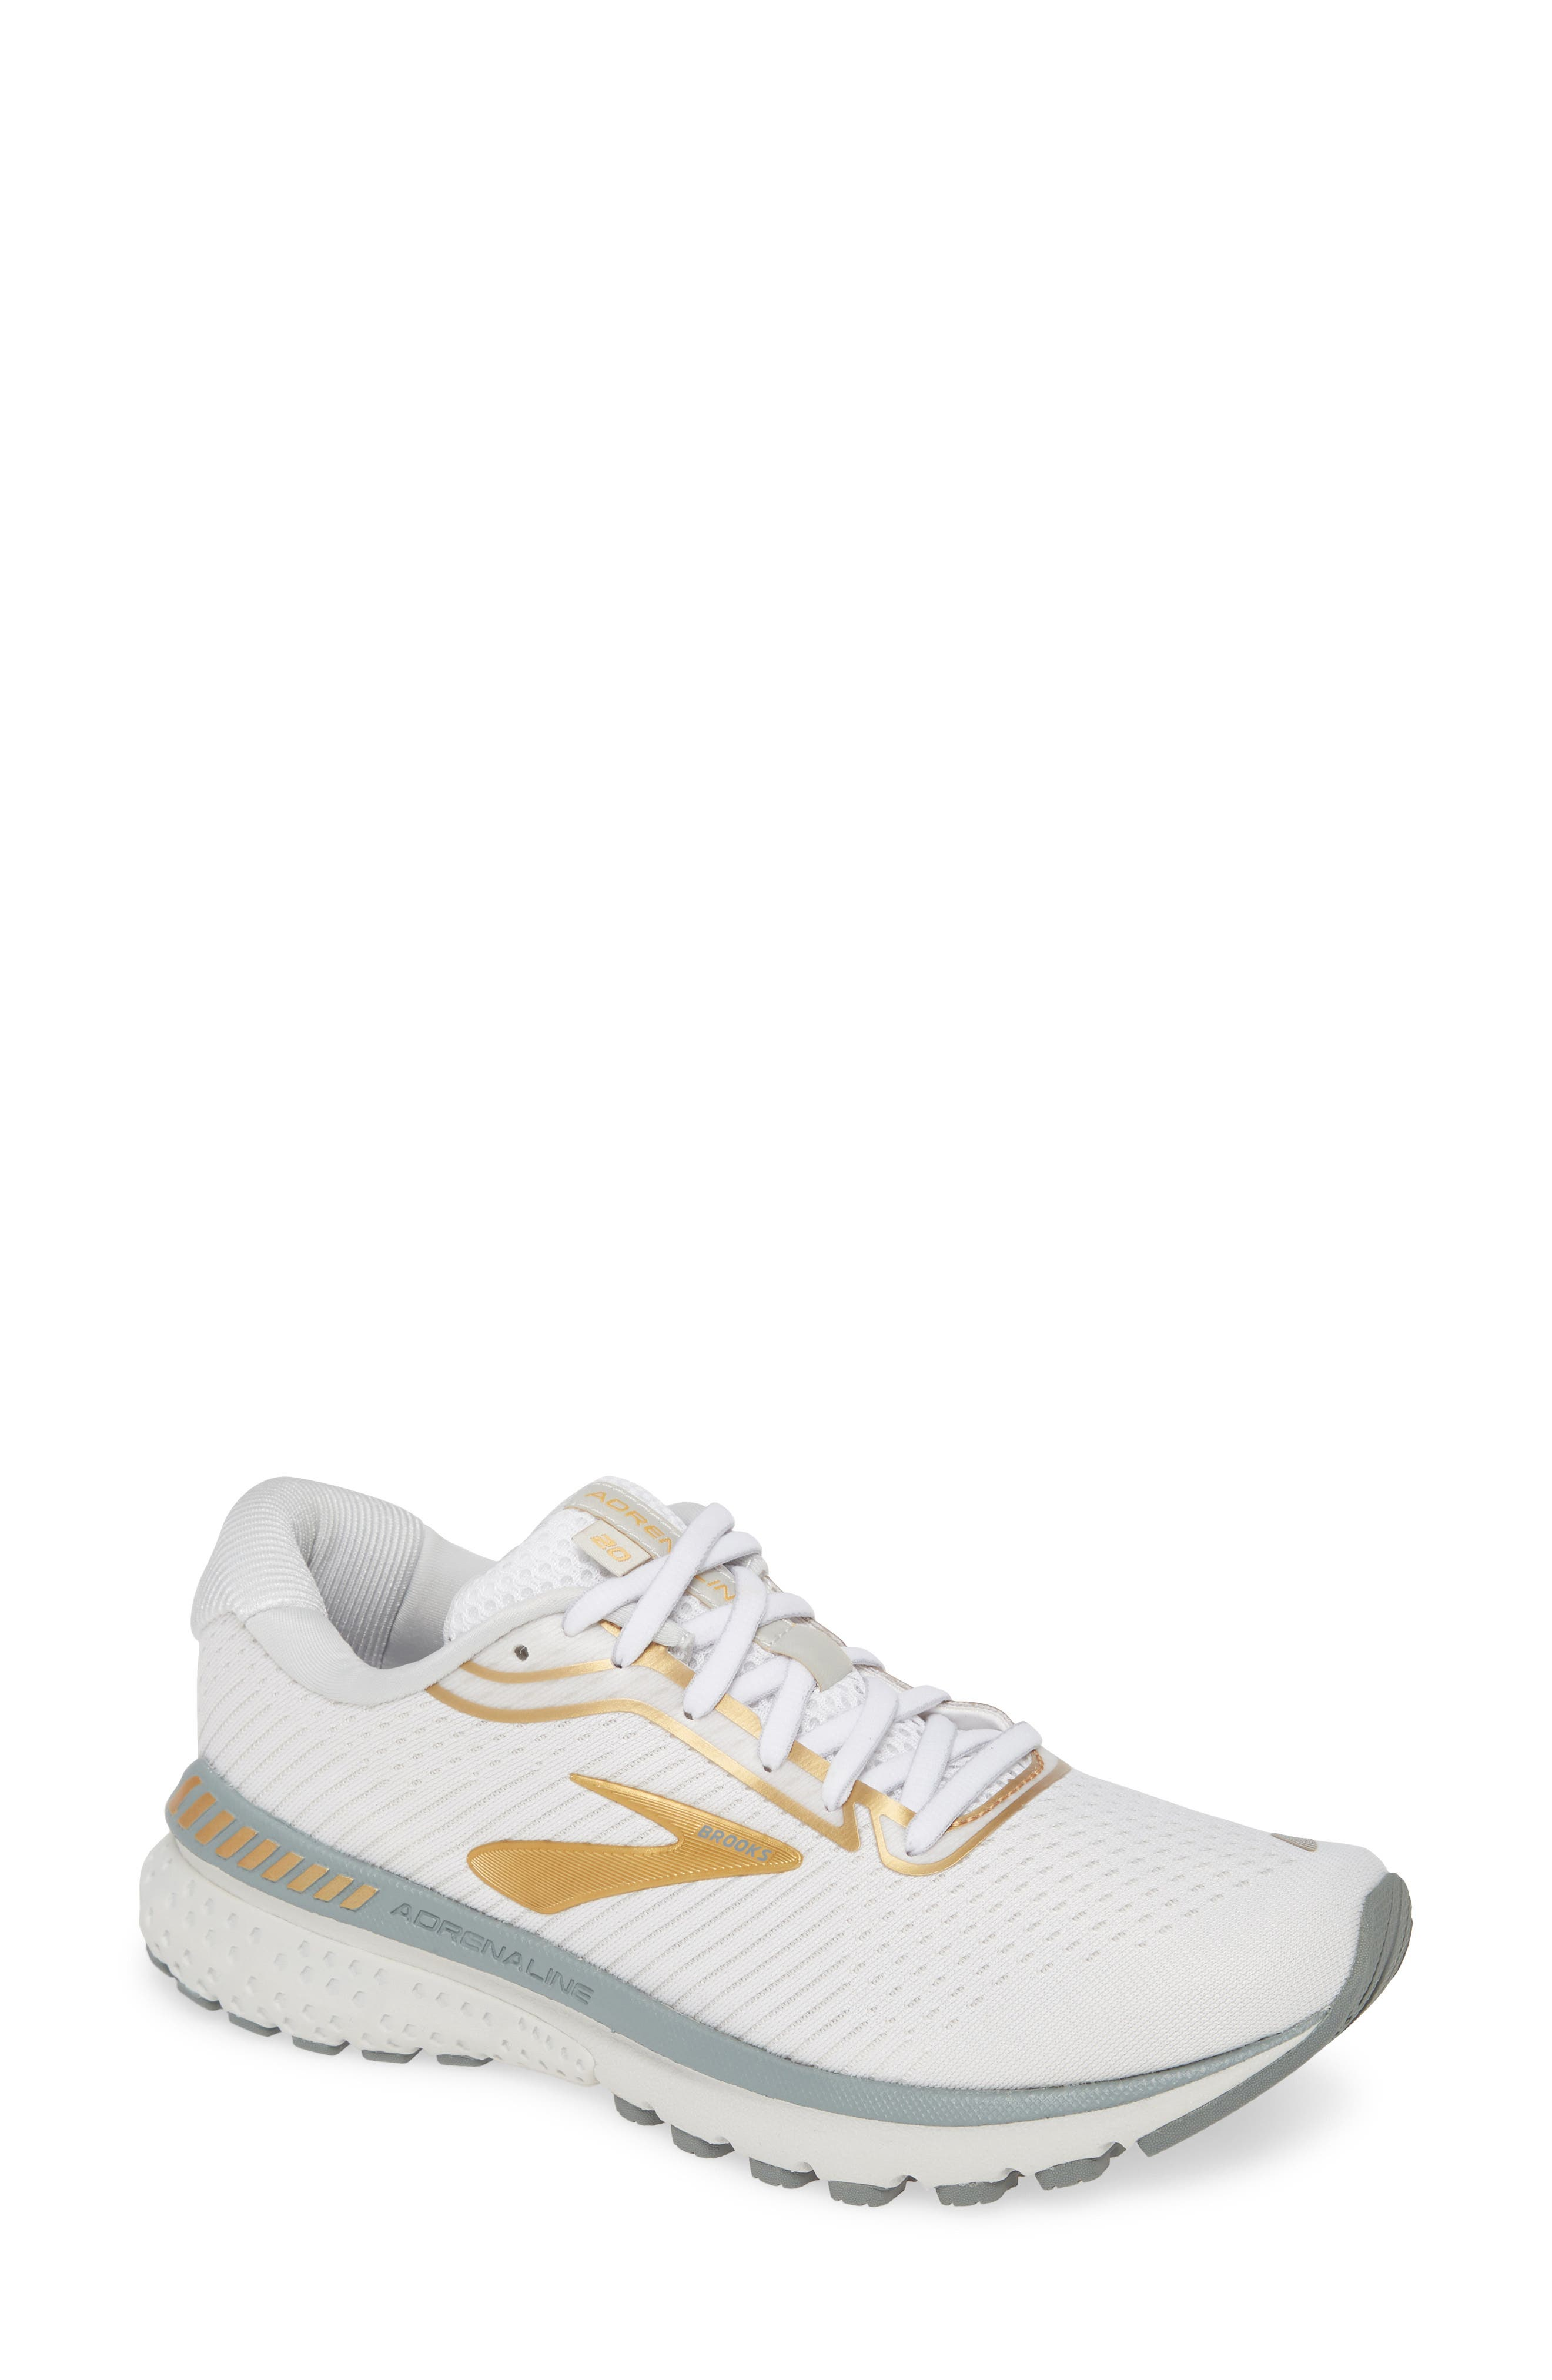 Adrenaline GTS 20 Road Running Shoe